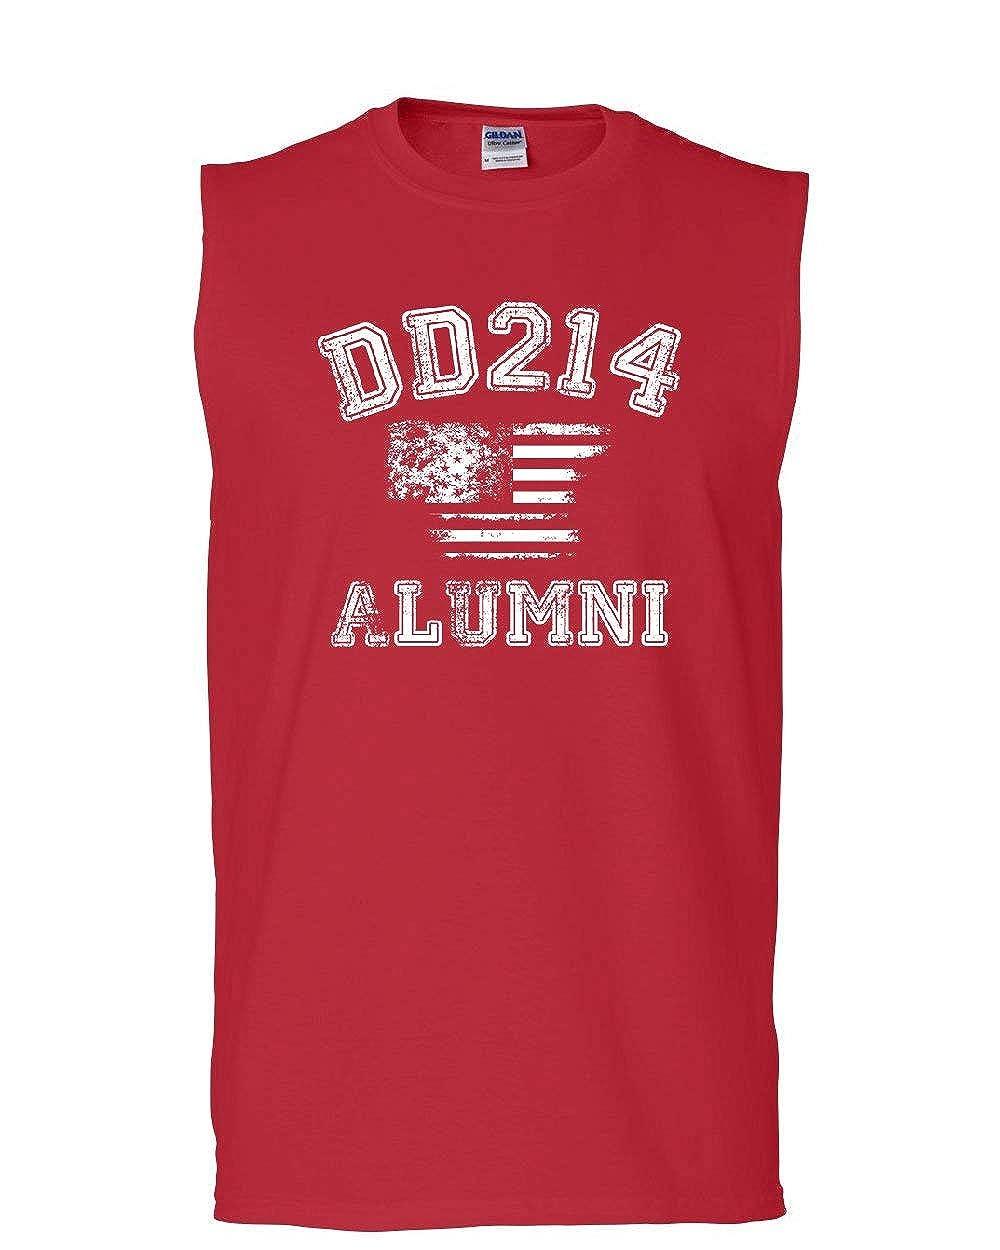 Tee Hunt DD214 Alumni Distressed American Flag Muscle Shirt Military Veteran Sleeveless